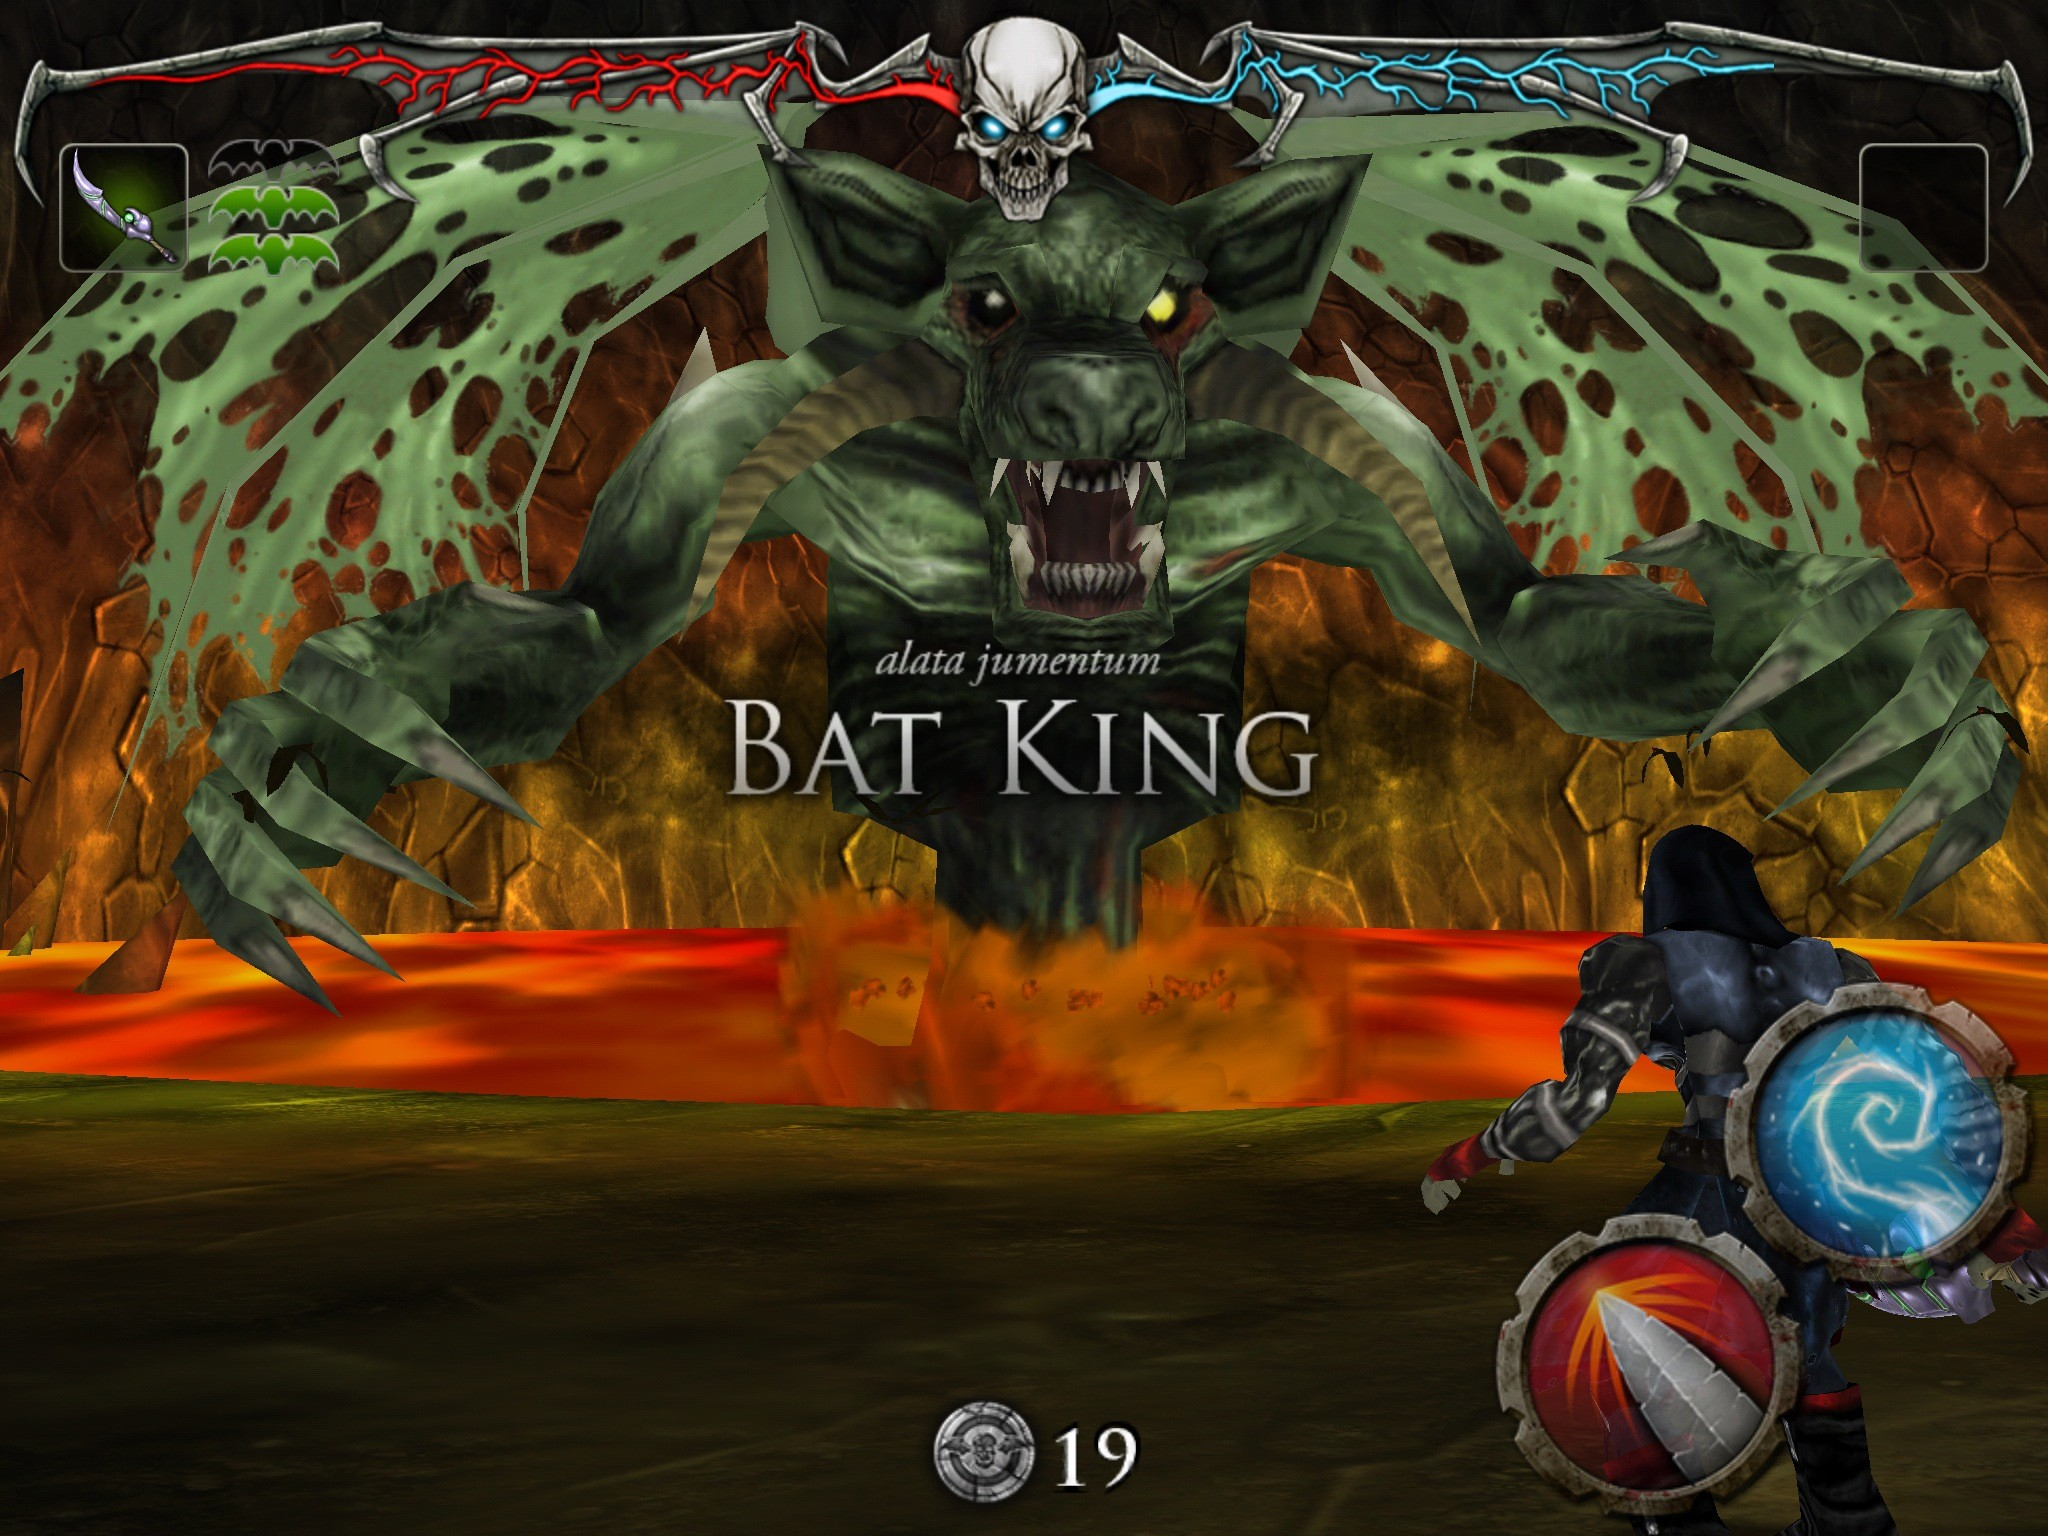 Hail to the King Deathbat (8)